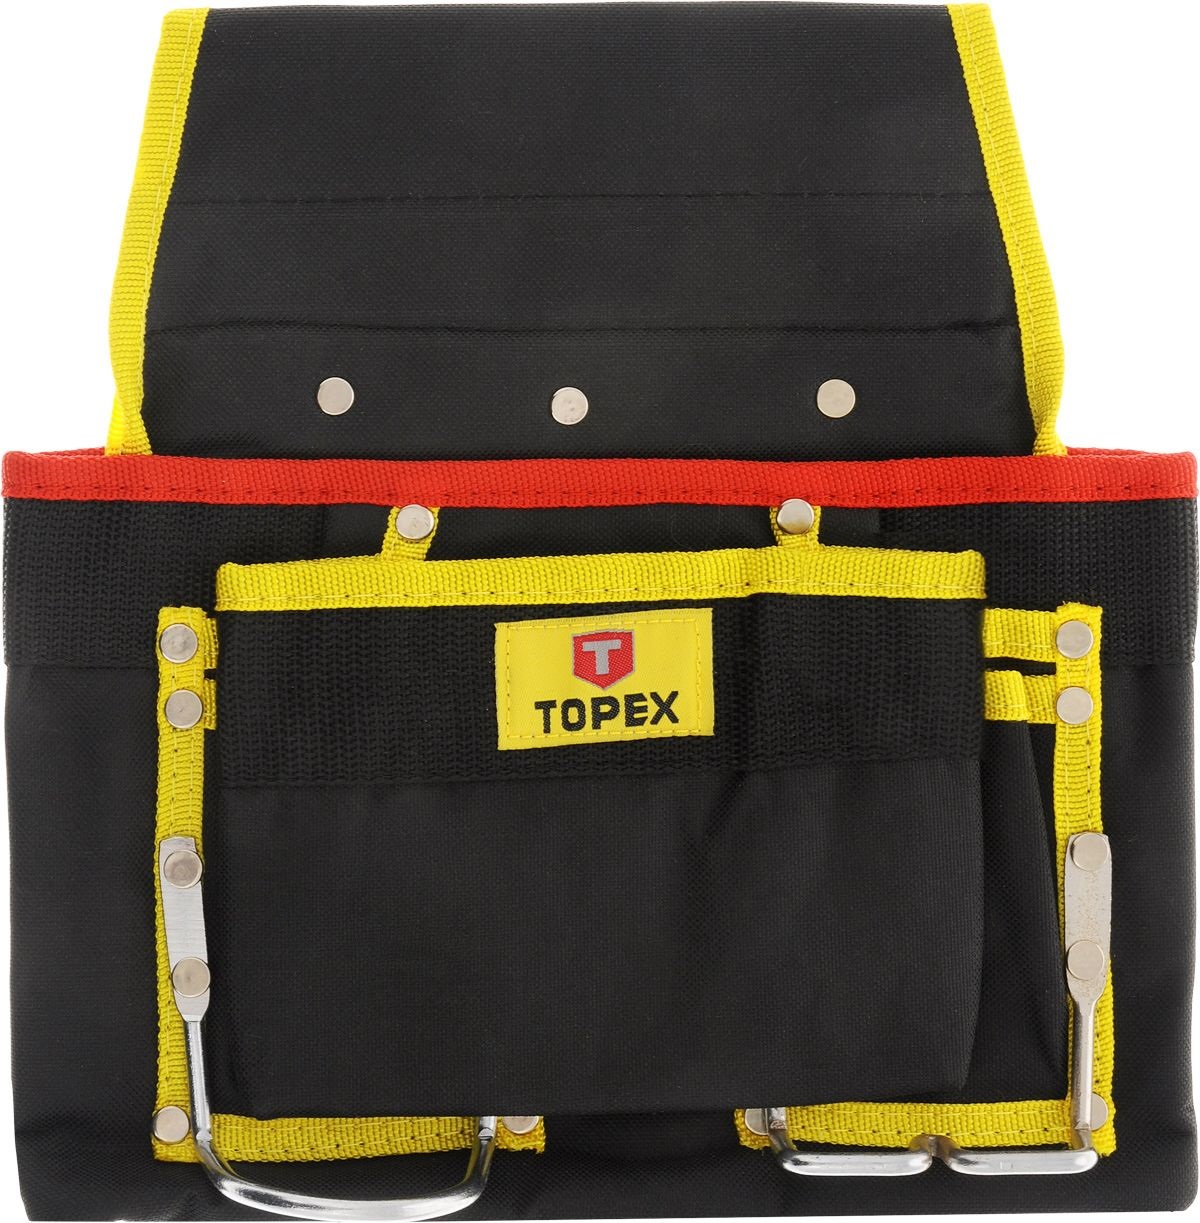 Сумка поясная для инструмента Topex